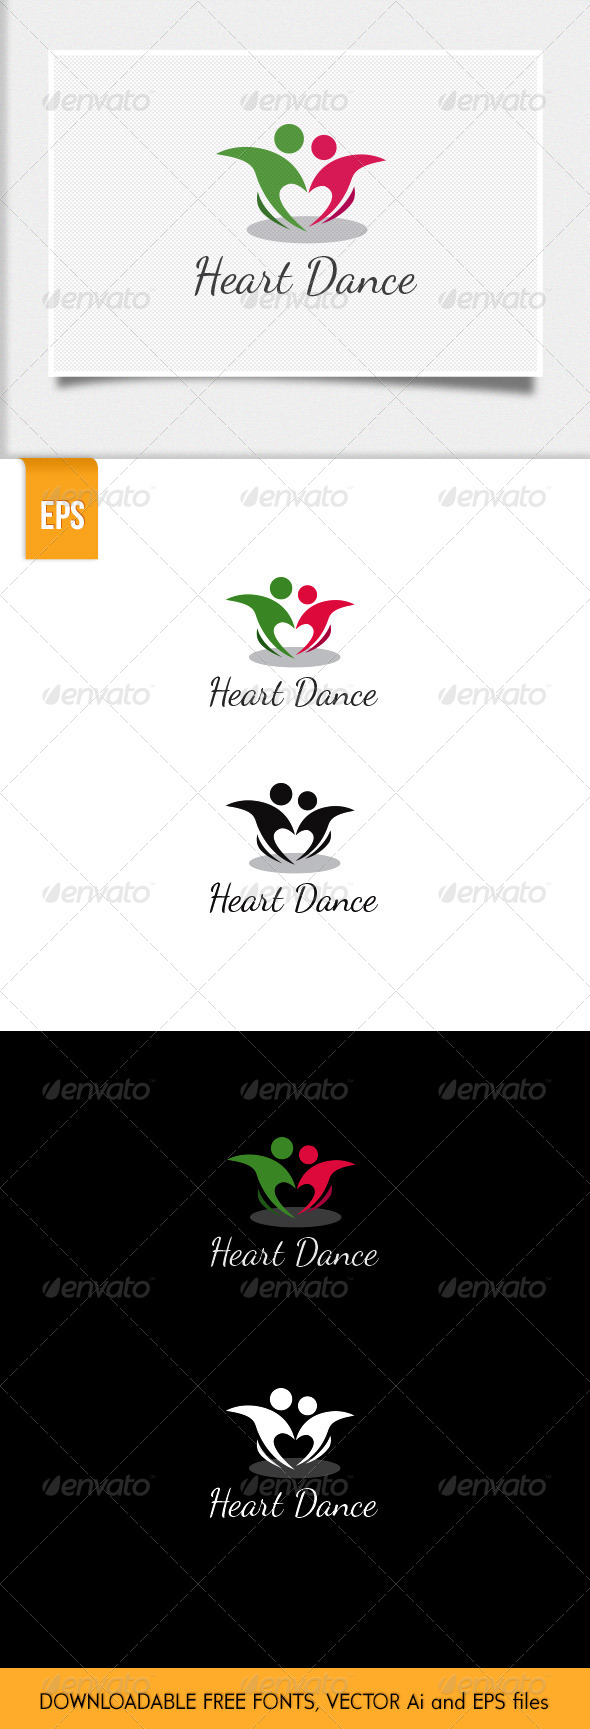 GraphicRiver Heart Dance Logo 6125591